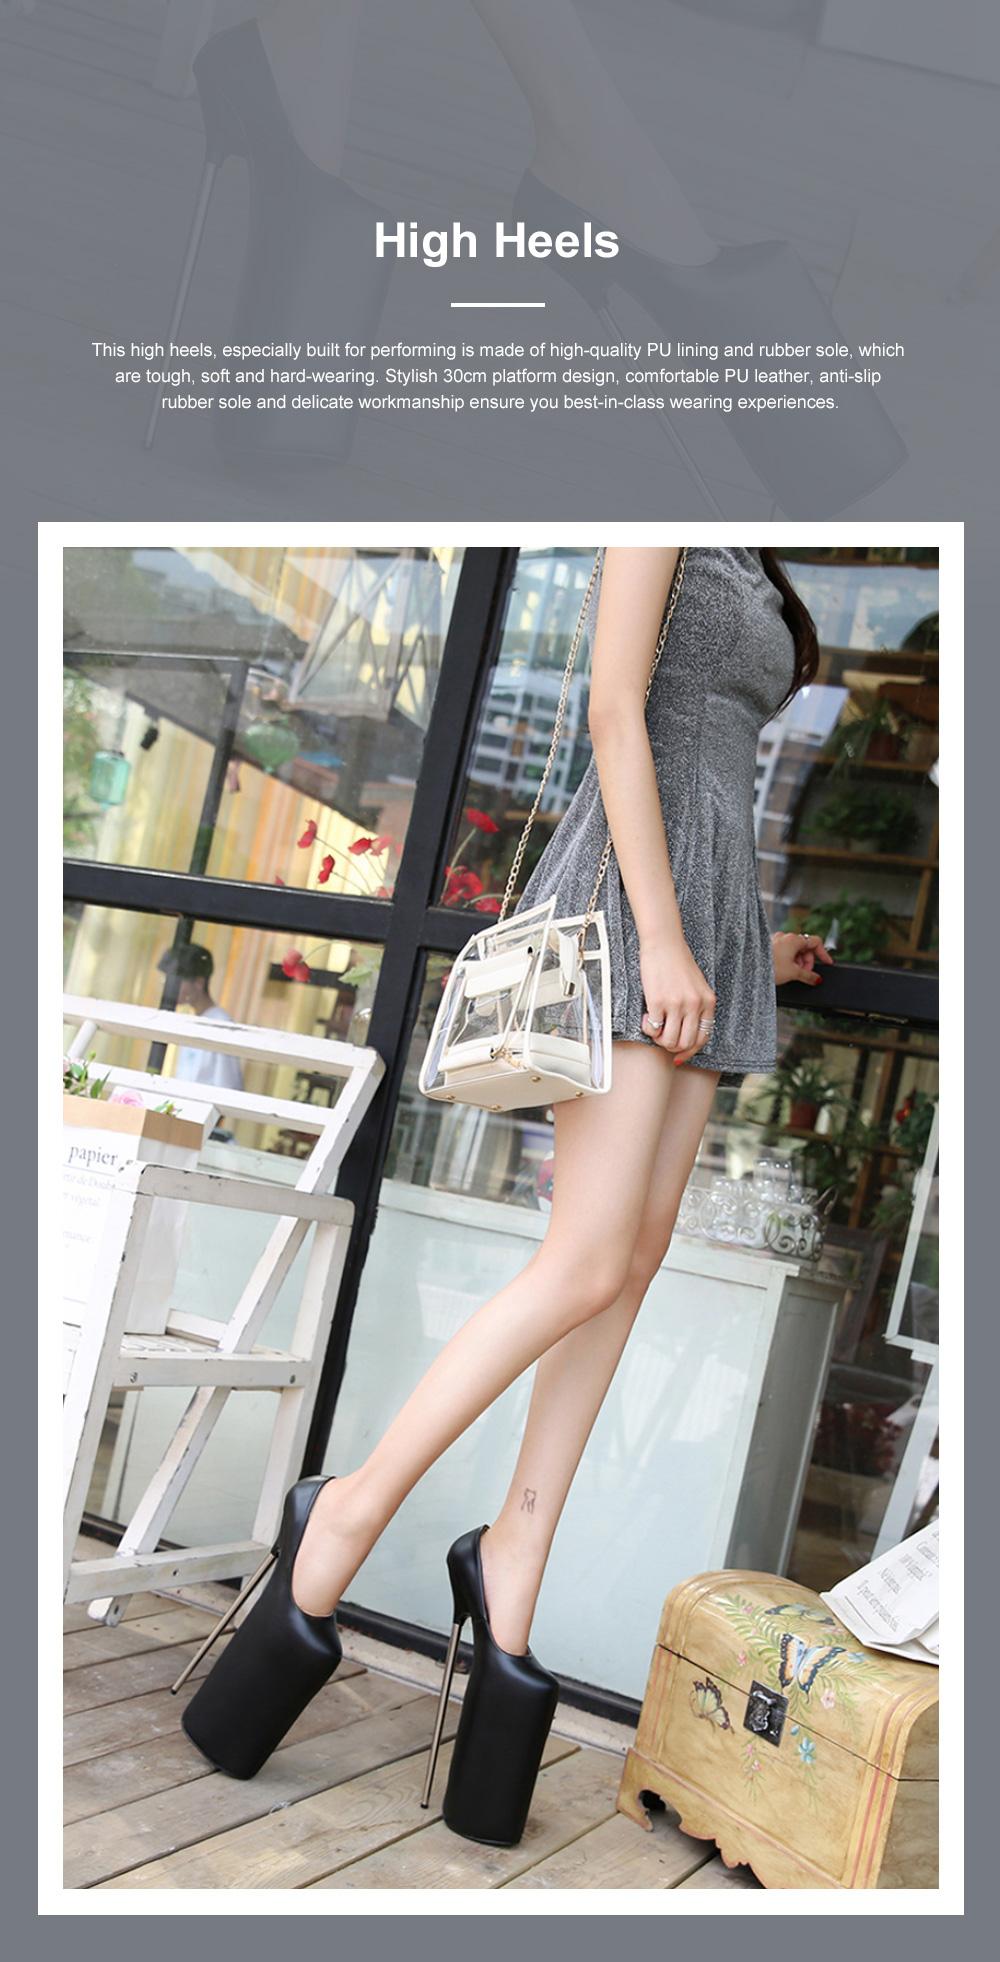 Stylish Sexy 30cm Platform Design High Heels Soft Skin-friendly PU Night Club Shoes with Anti-slip Rubber Sole Ins Hot 0